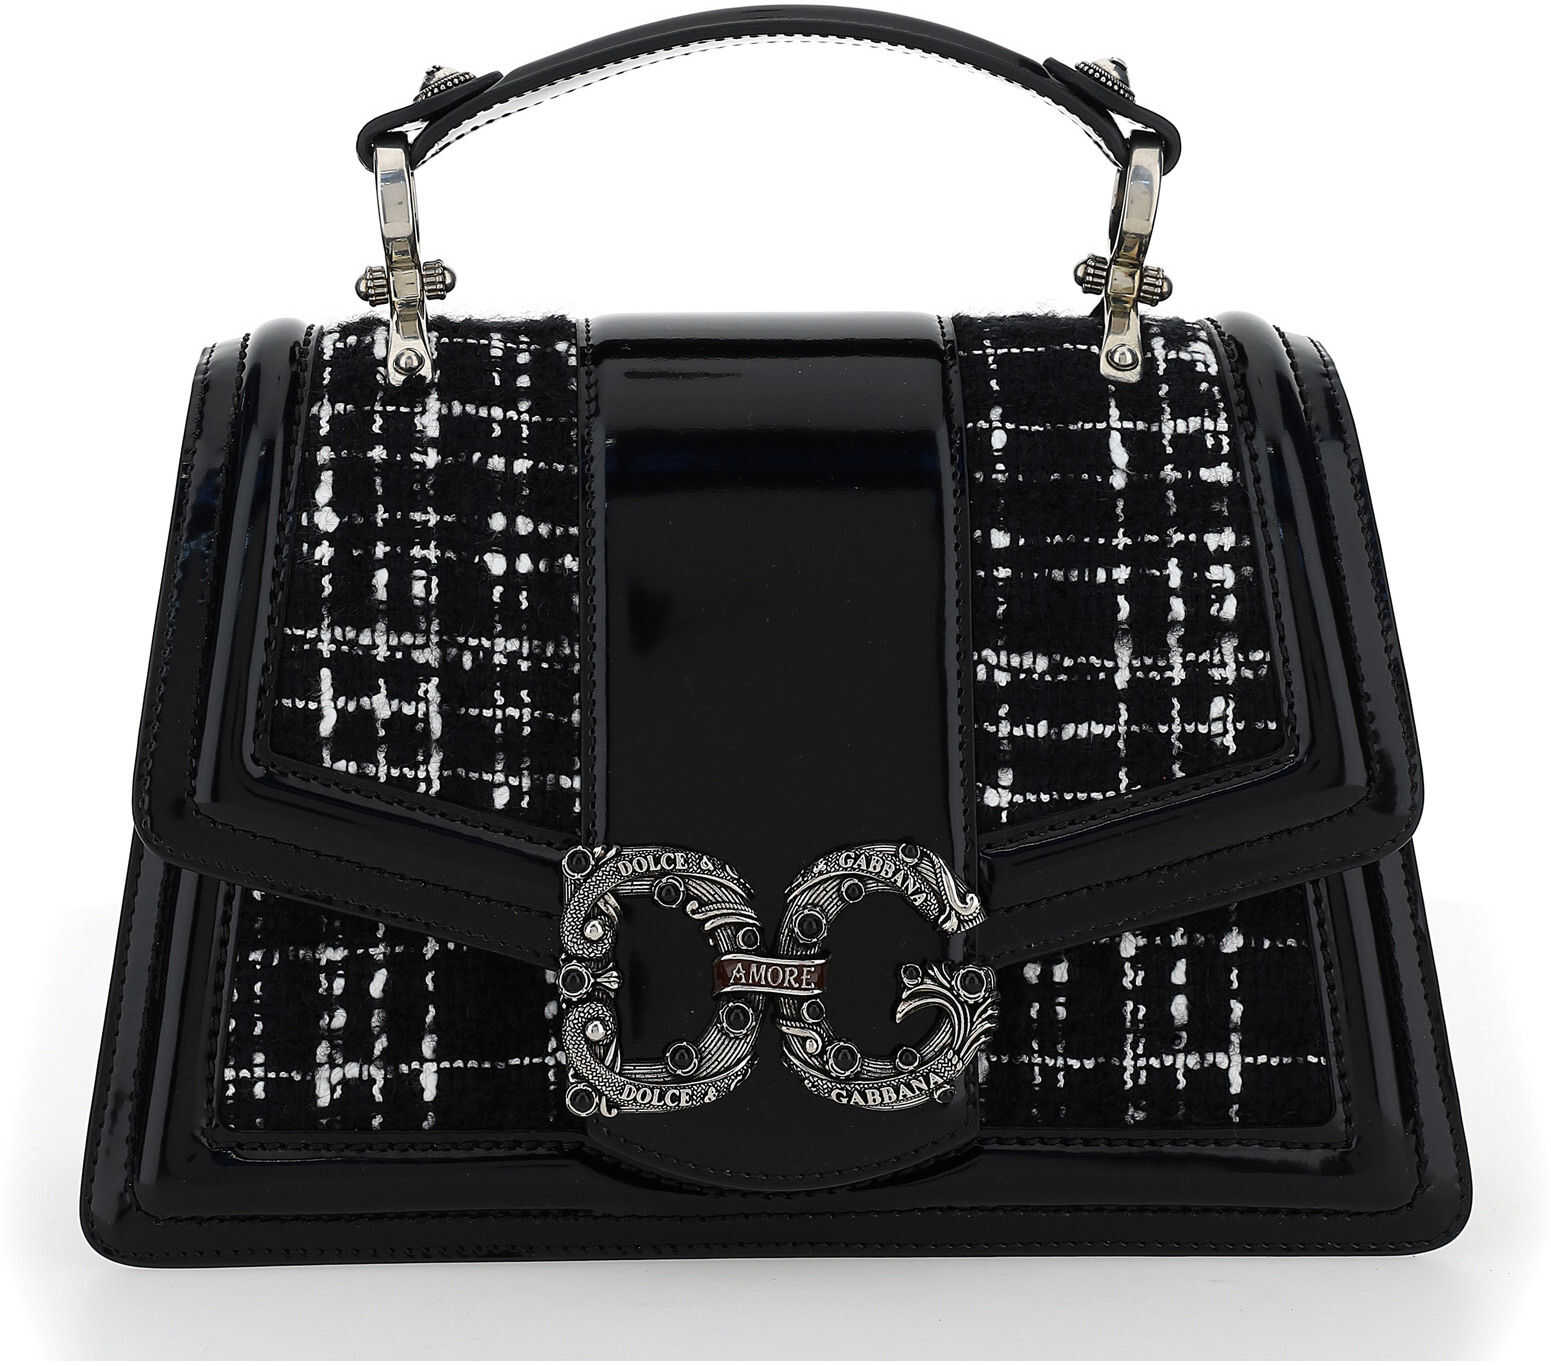 Dolce & Gabbana Handbag BB6675AW046 NERO/BIANCO imagine b-mall.ro